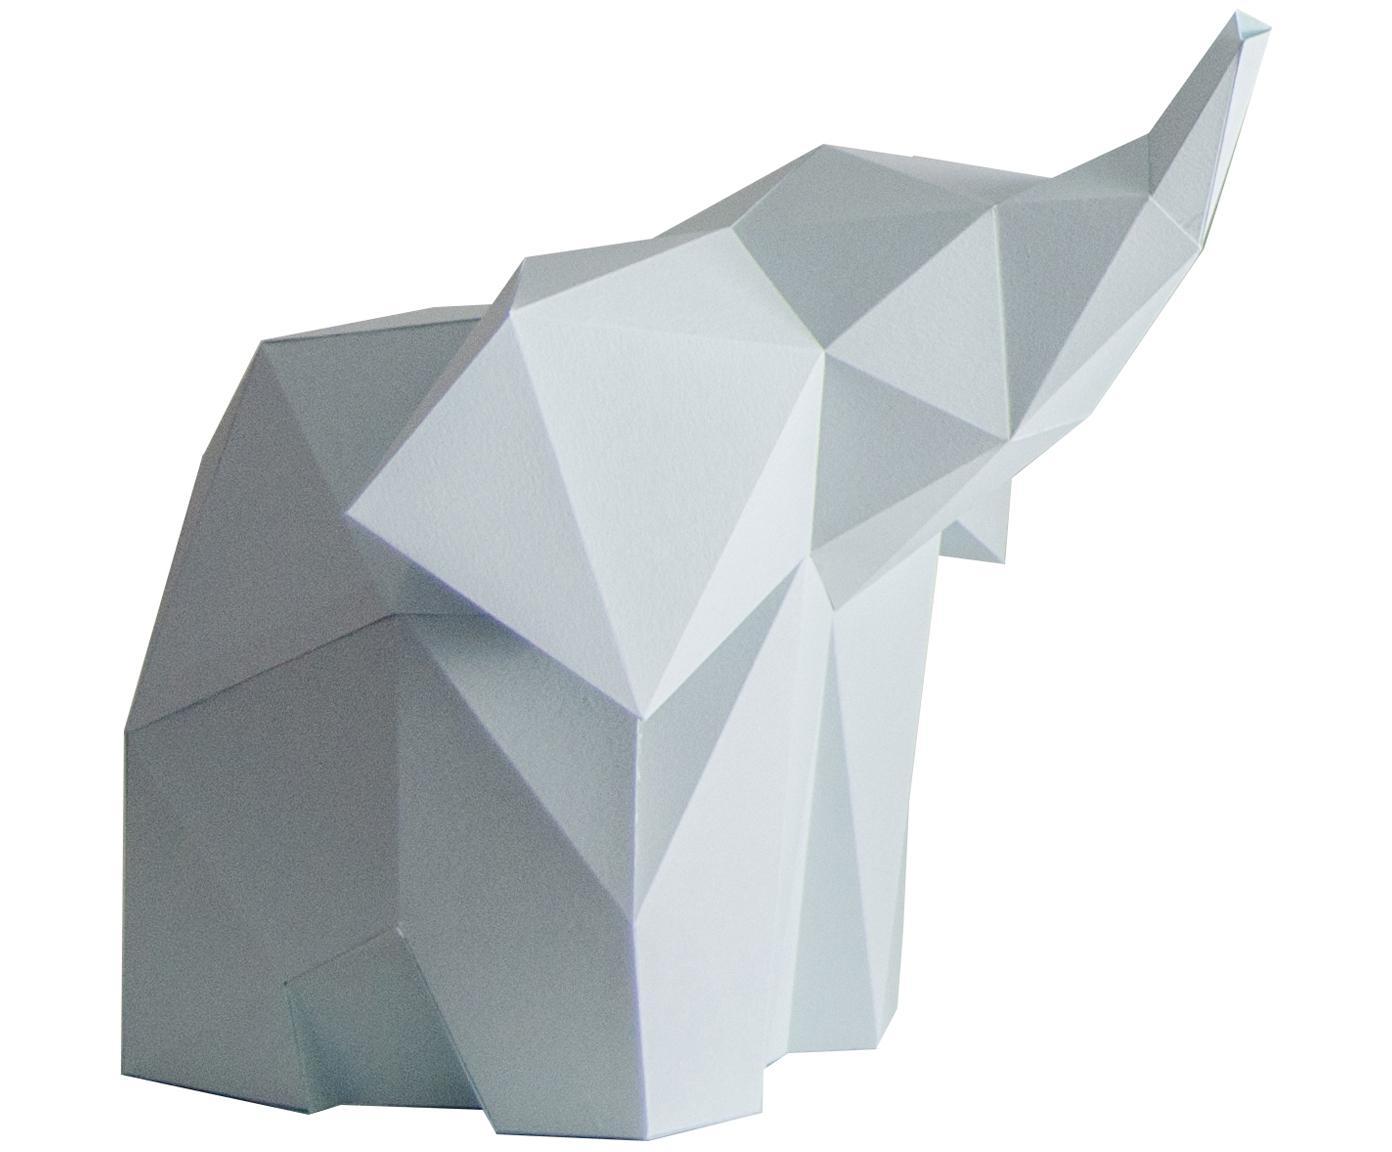 Lámpara de mesa LED Baby Elephant, kit de montaje, Pantalla: papel, 160 g/m², Azul claro, An 23 x Al 24 cm